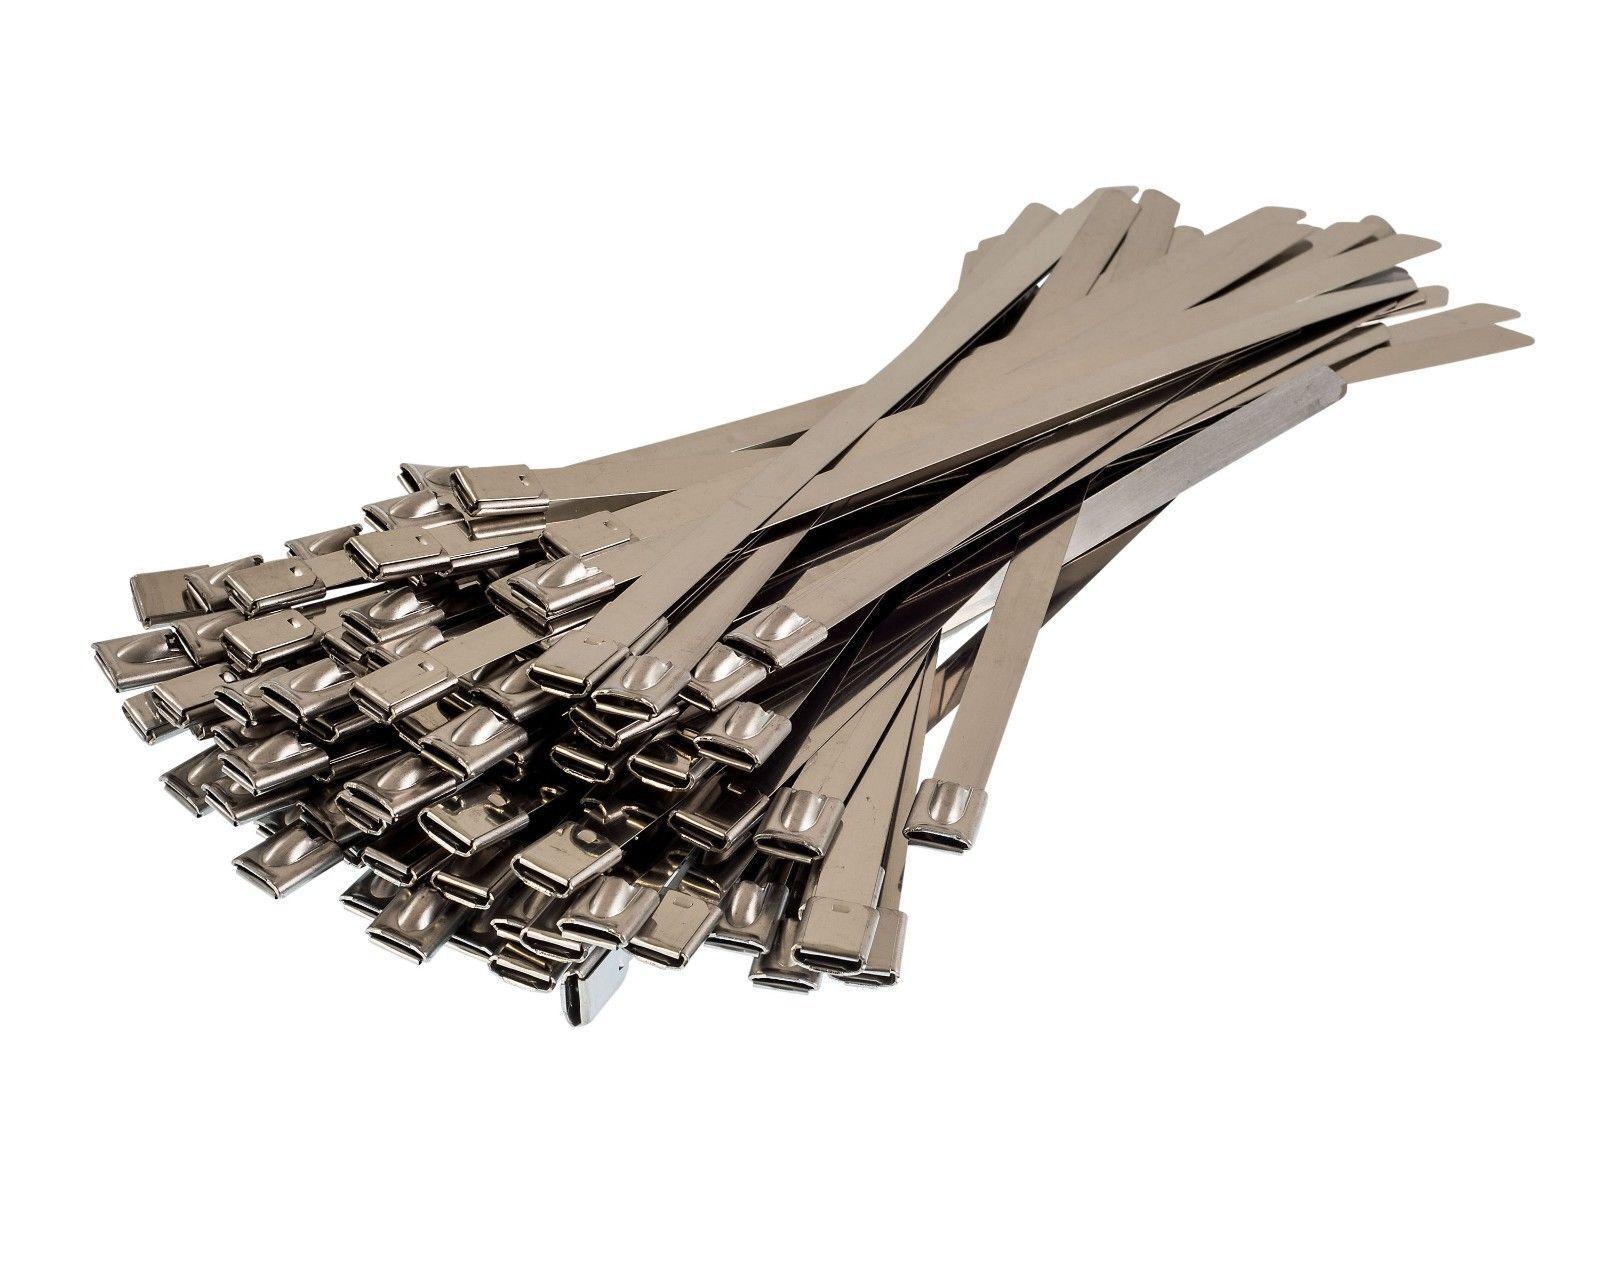 CT300SSW Stainless Steel 100 Cable Tie 300X7.6mm Metal Zip Wraps 316 Grade Ties